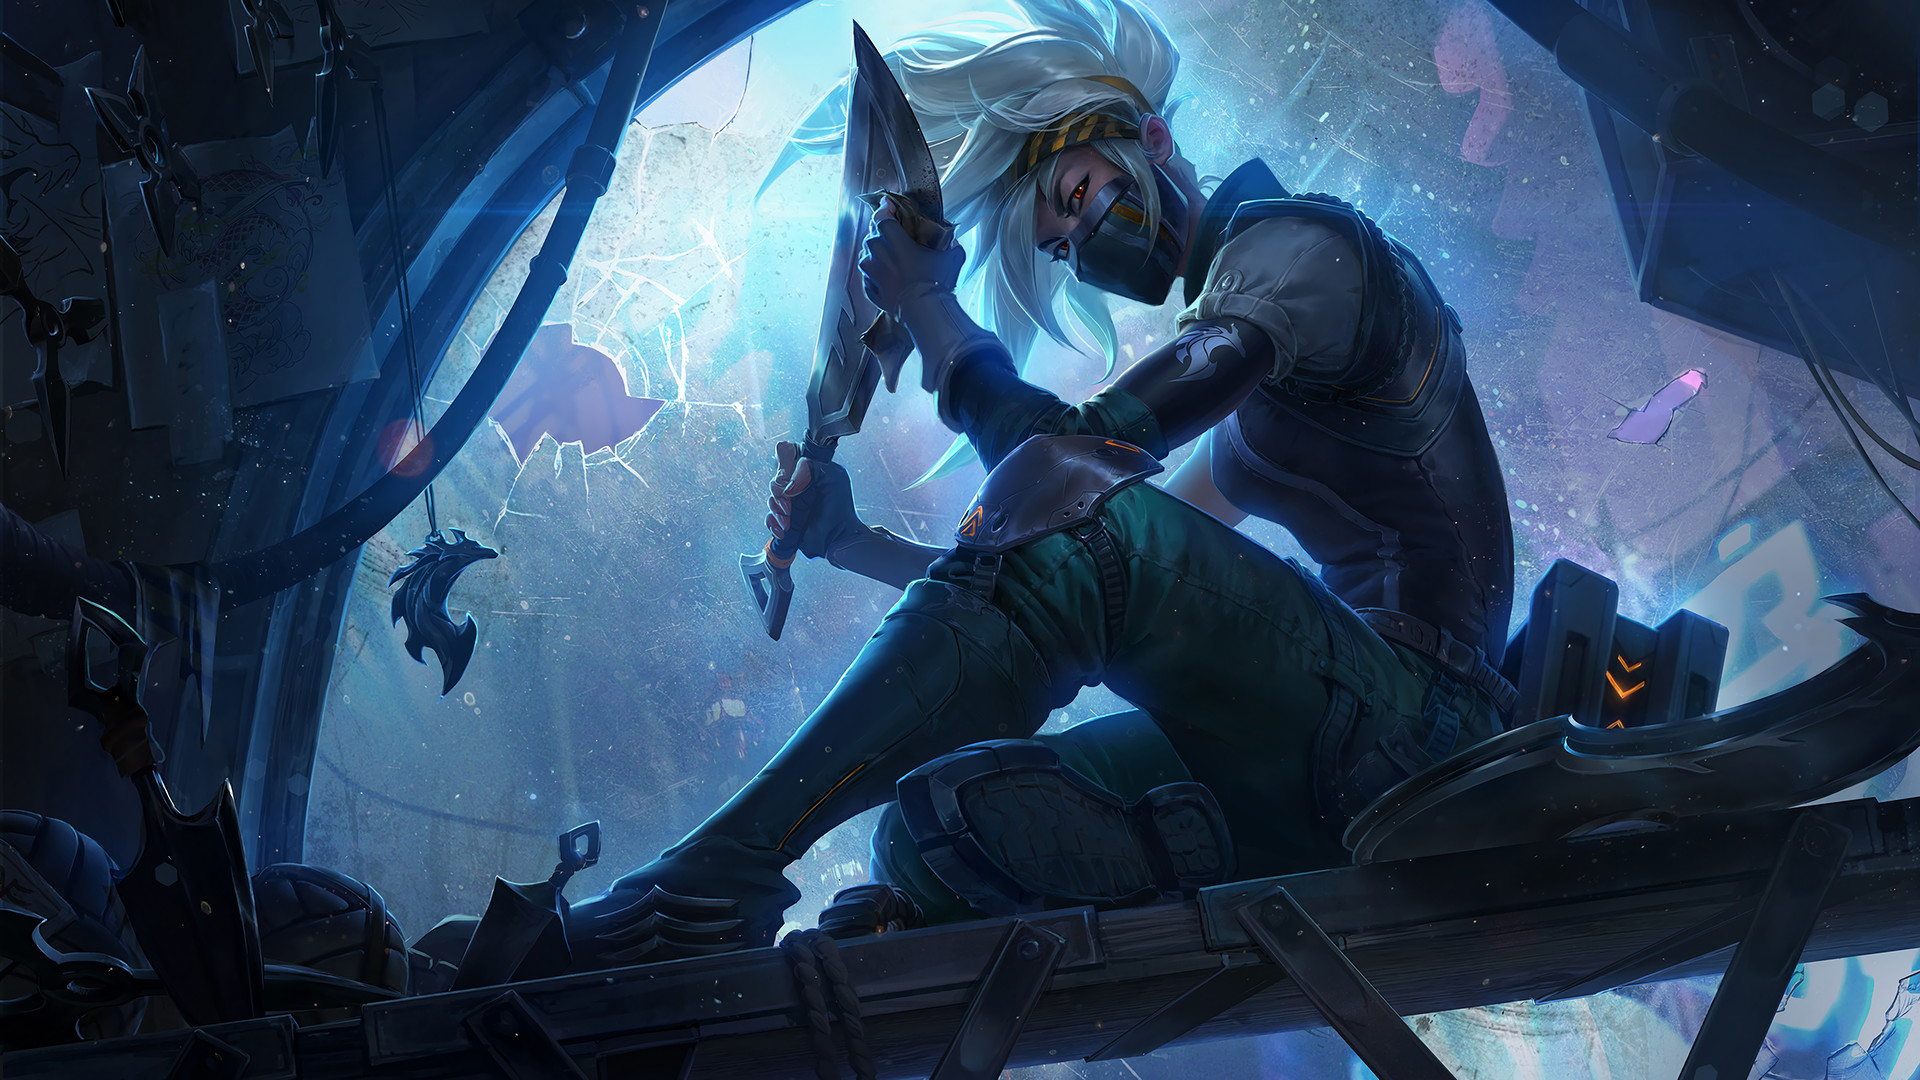 jennifer-wuestling-silverfang-akali-splash-art-rework-update-hd-wallpaper-background-official-art-artwork-league-of-legends-lol.jpg